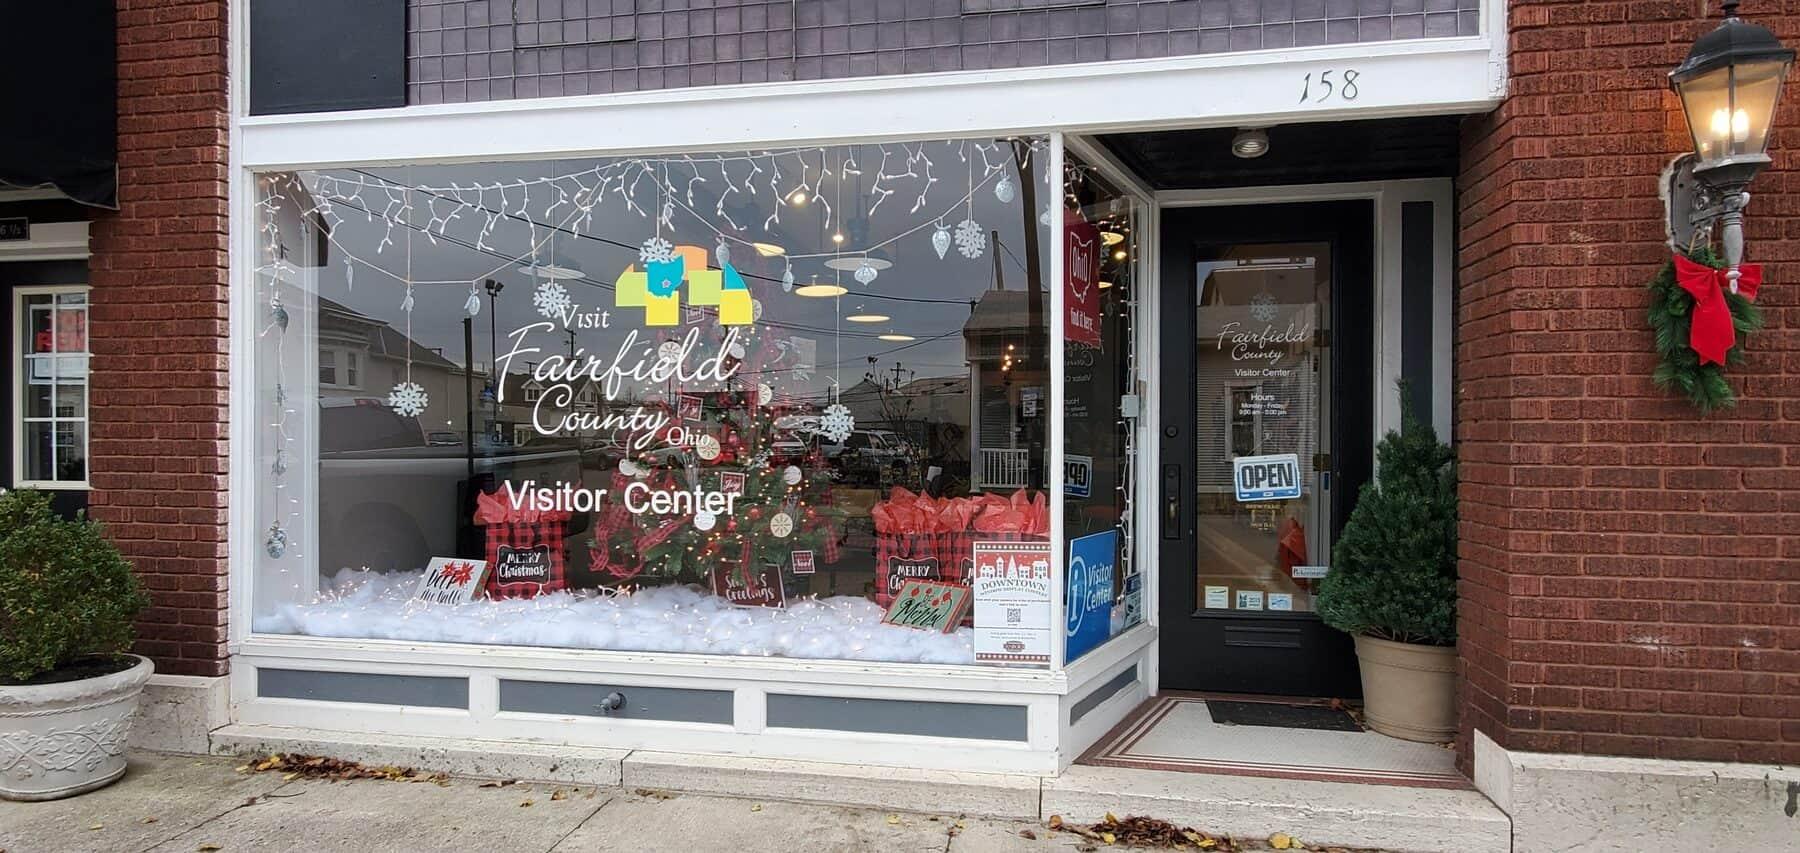 Visit Fairfield County Ohio Visitors Center